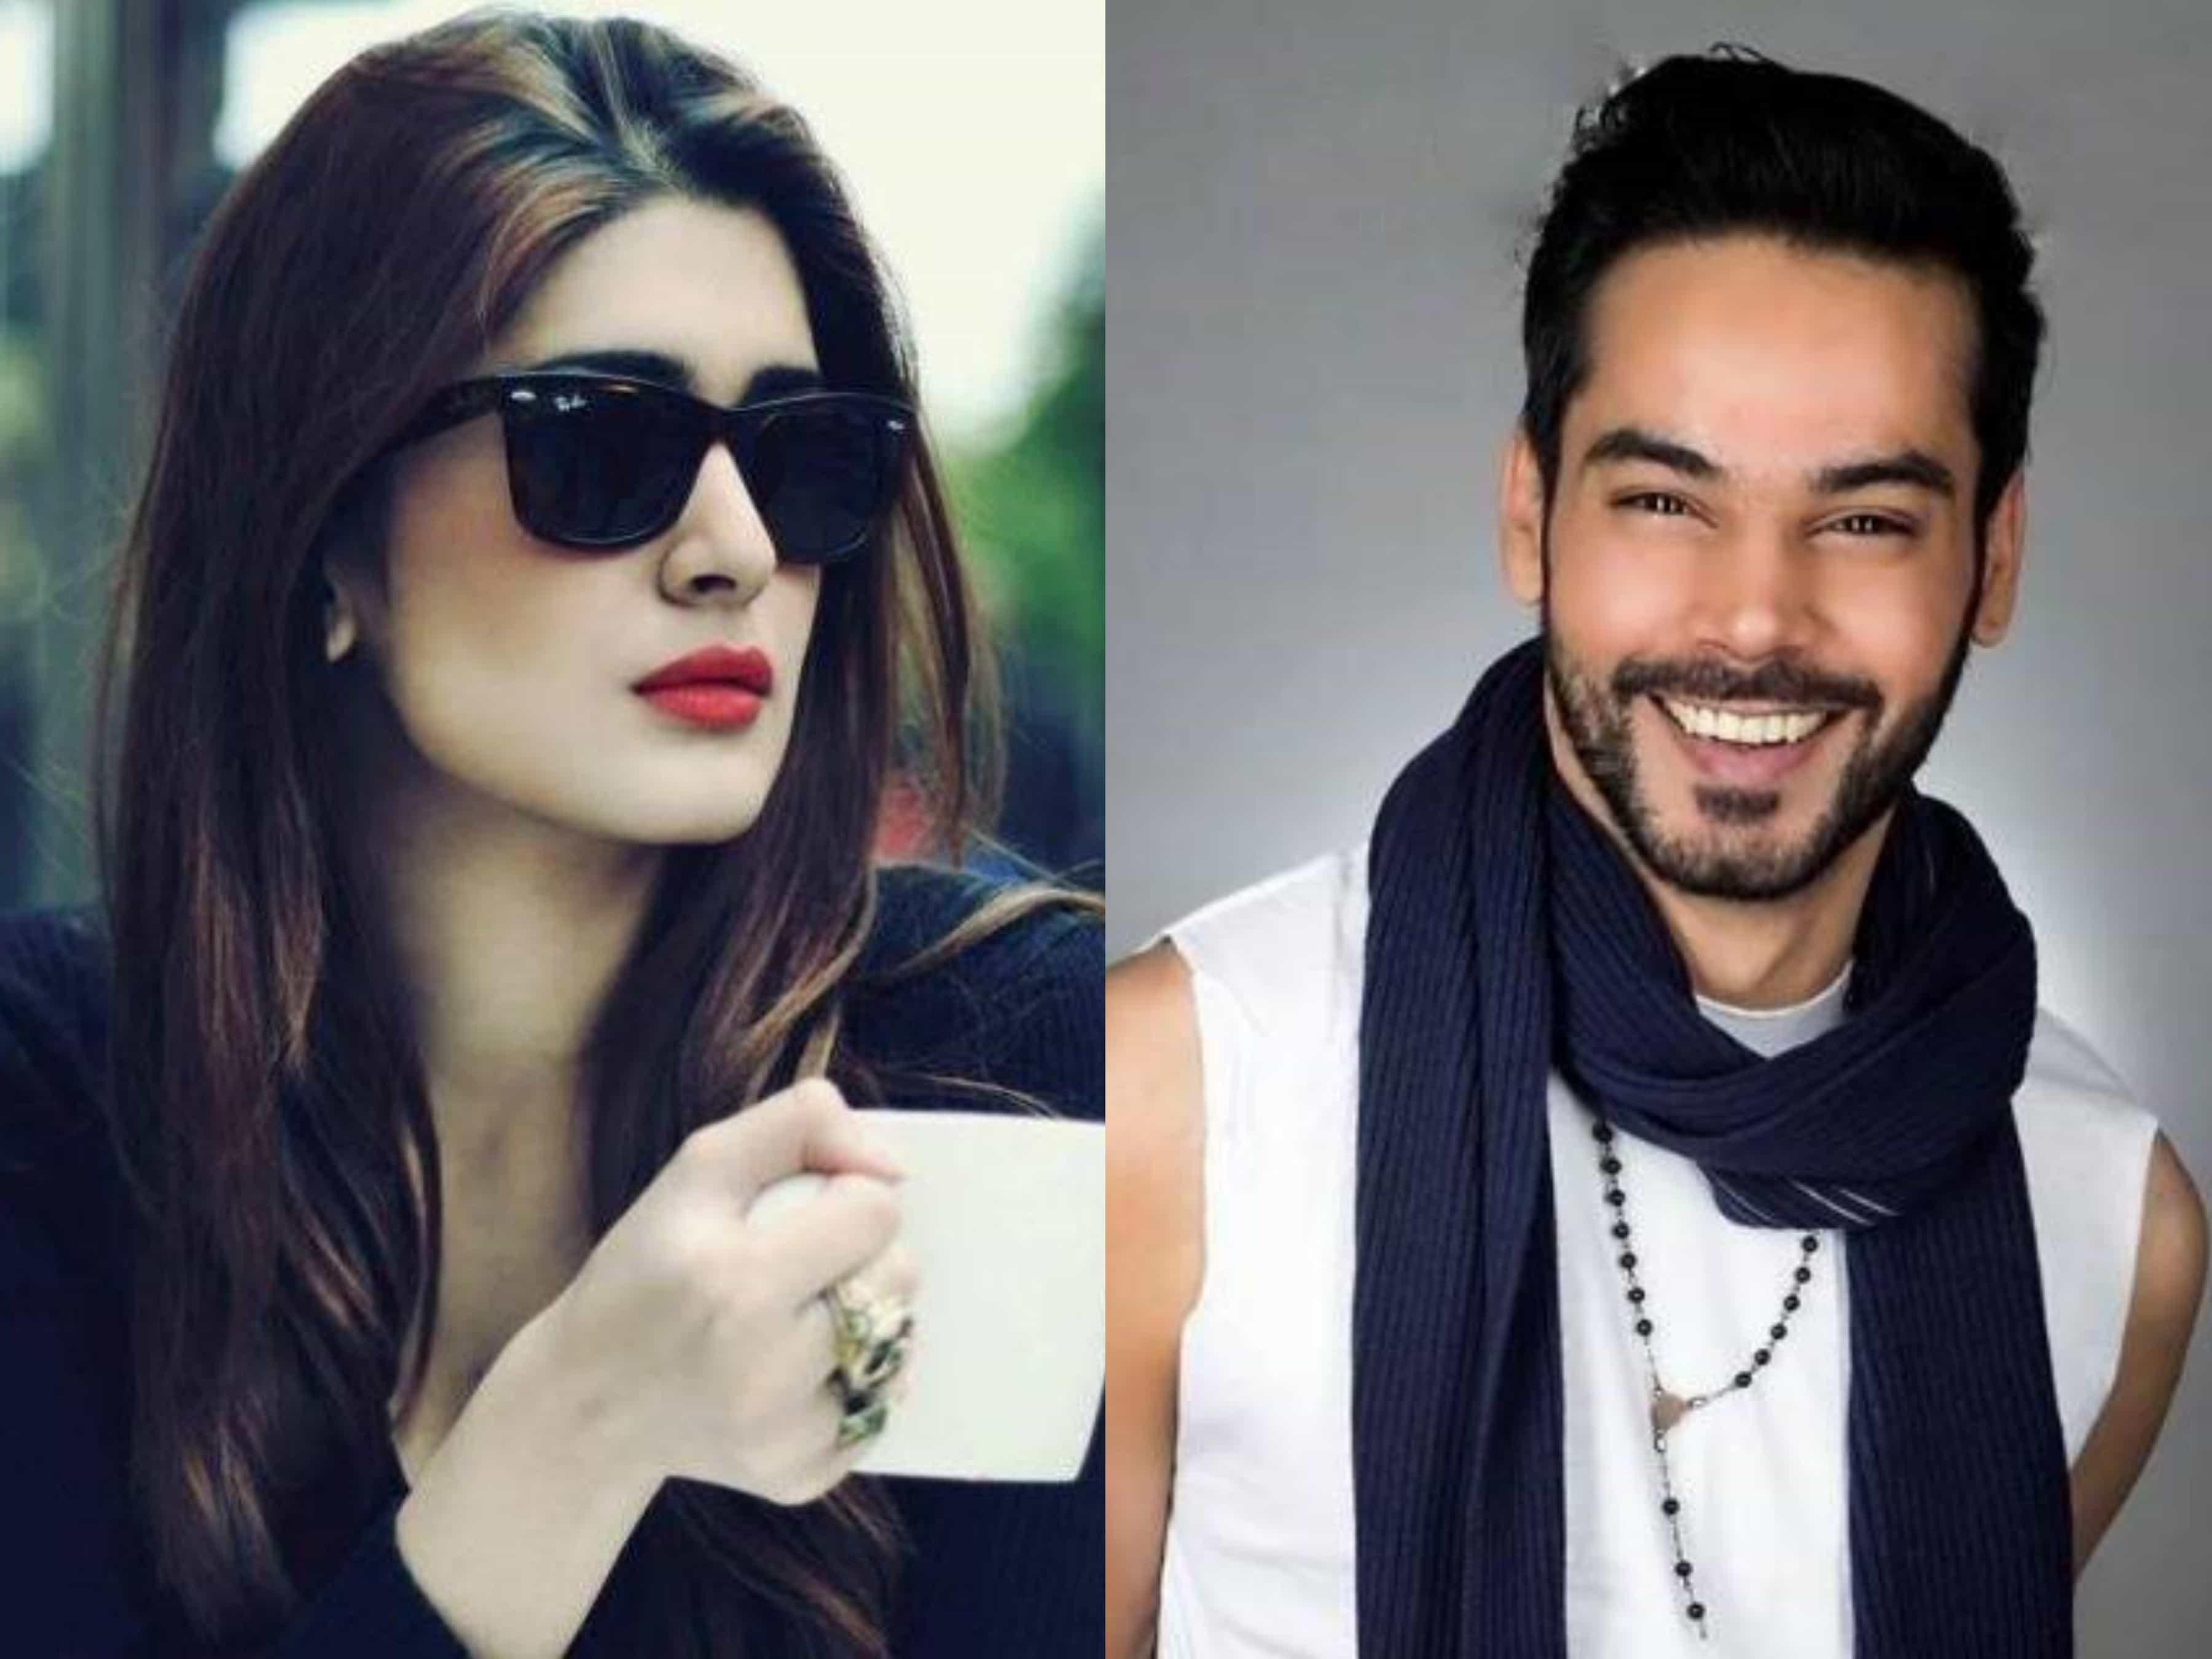 Gohar Rasheed Pakistani RJ And Television Actor Celebrity cknov Pak101dotcom Fotor Collage